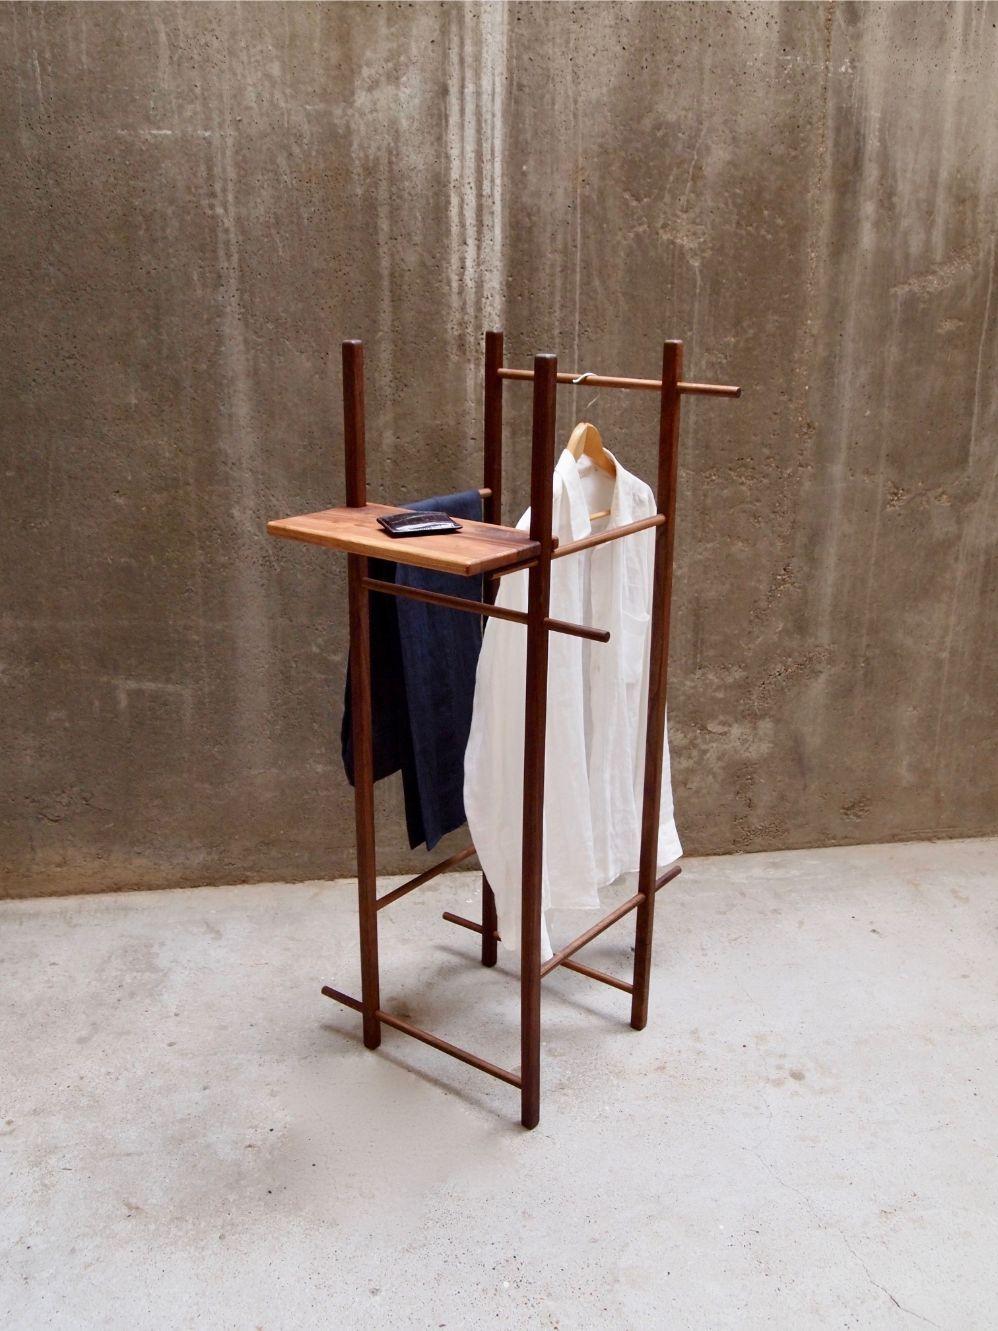 Minimal Stummer Diener Holz Mit Ohne Regal Tidyboy Berlin Minimal Furniture Valet Stand Fine Furnishings